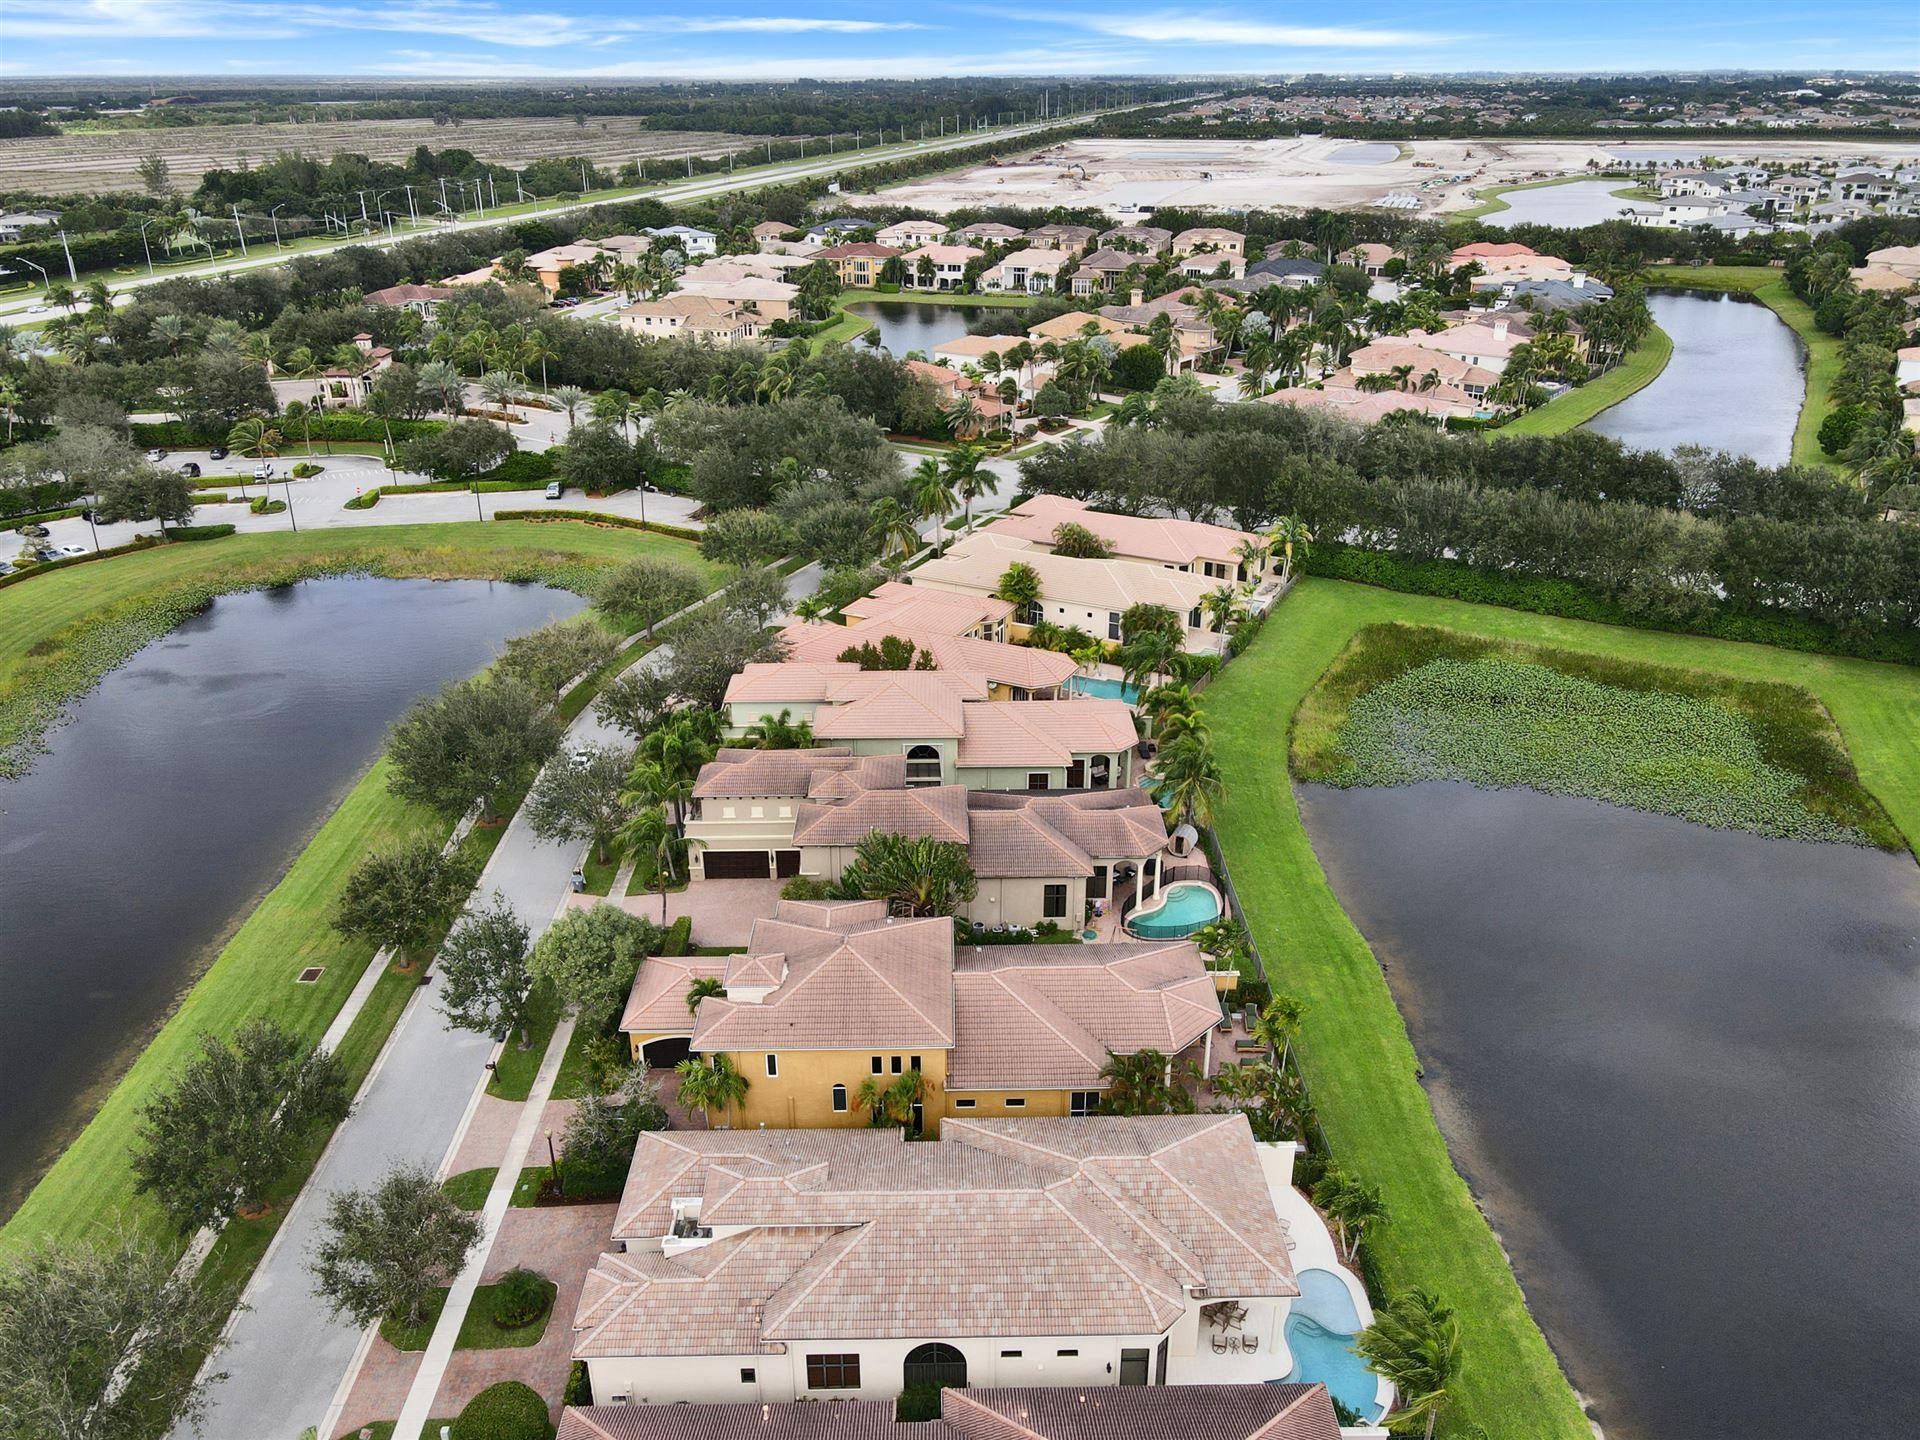 Photo of 17784 Villa Club Way, Boca Raton, FL 33496 (MLS # RX-10674623)